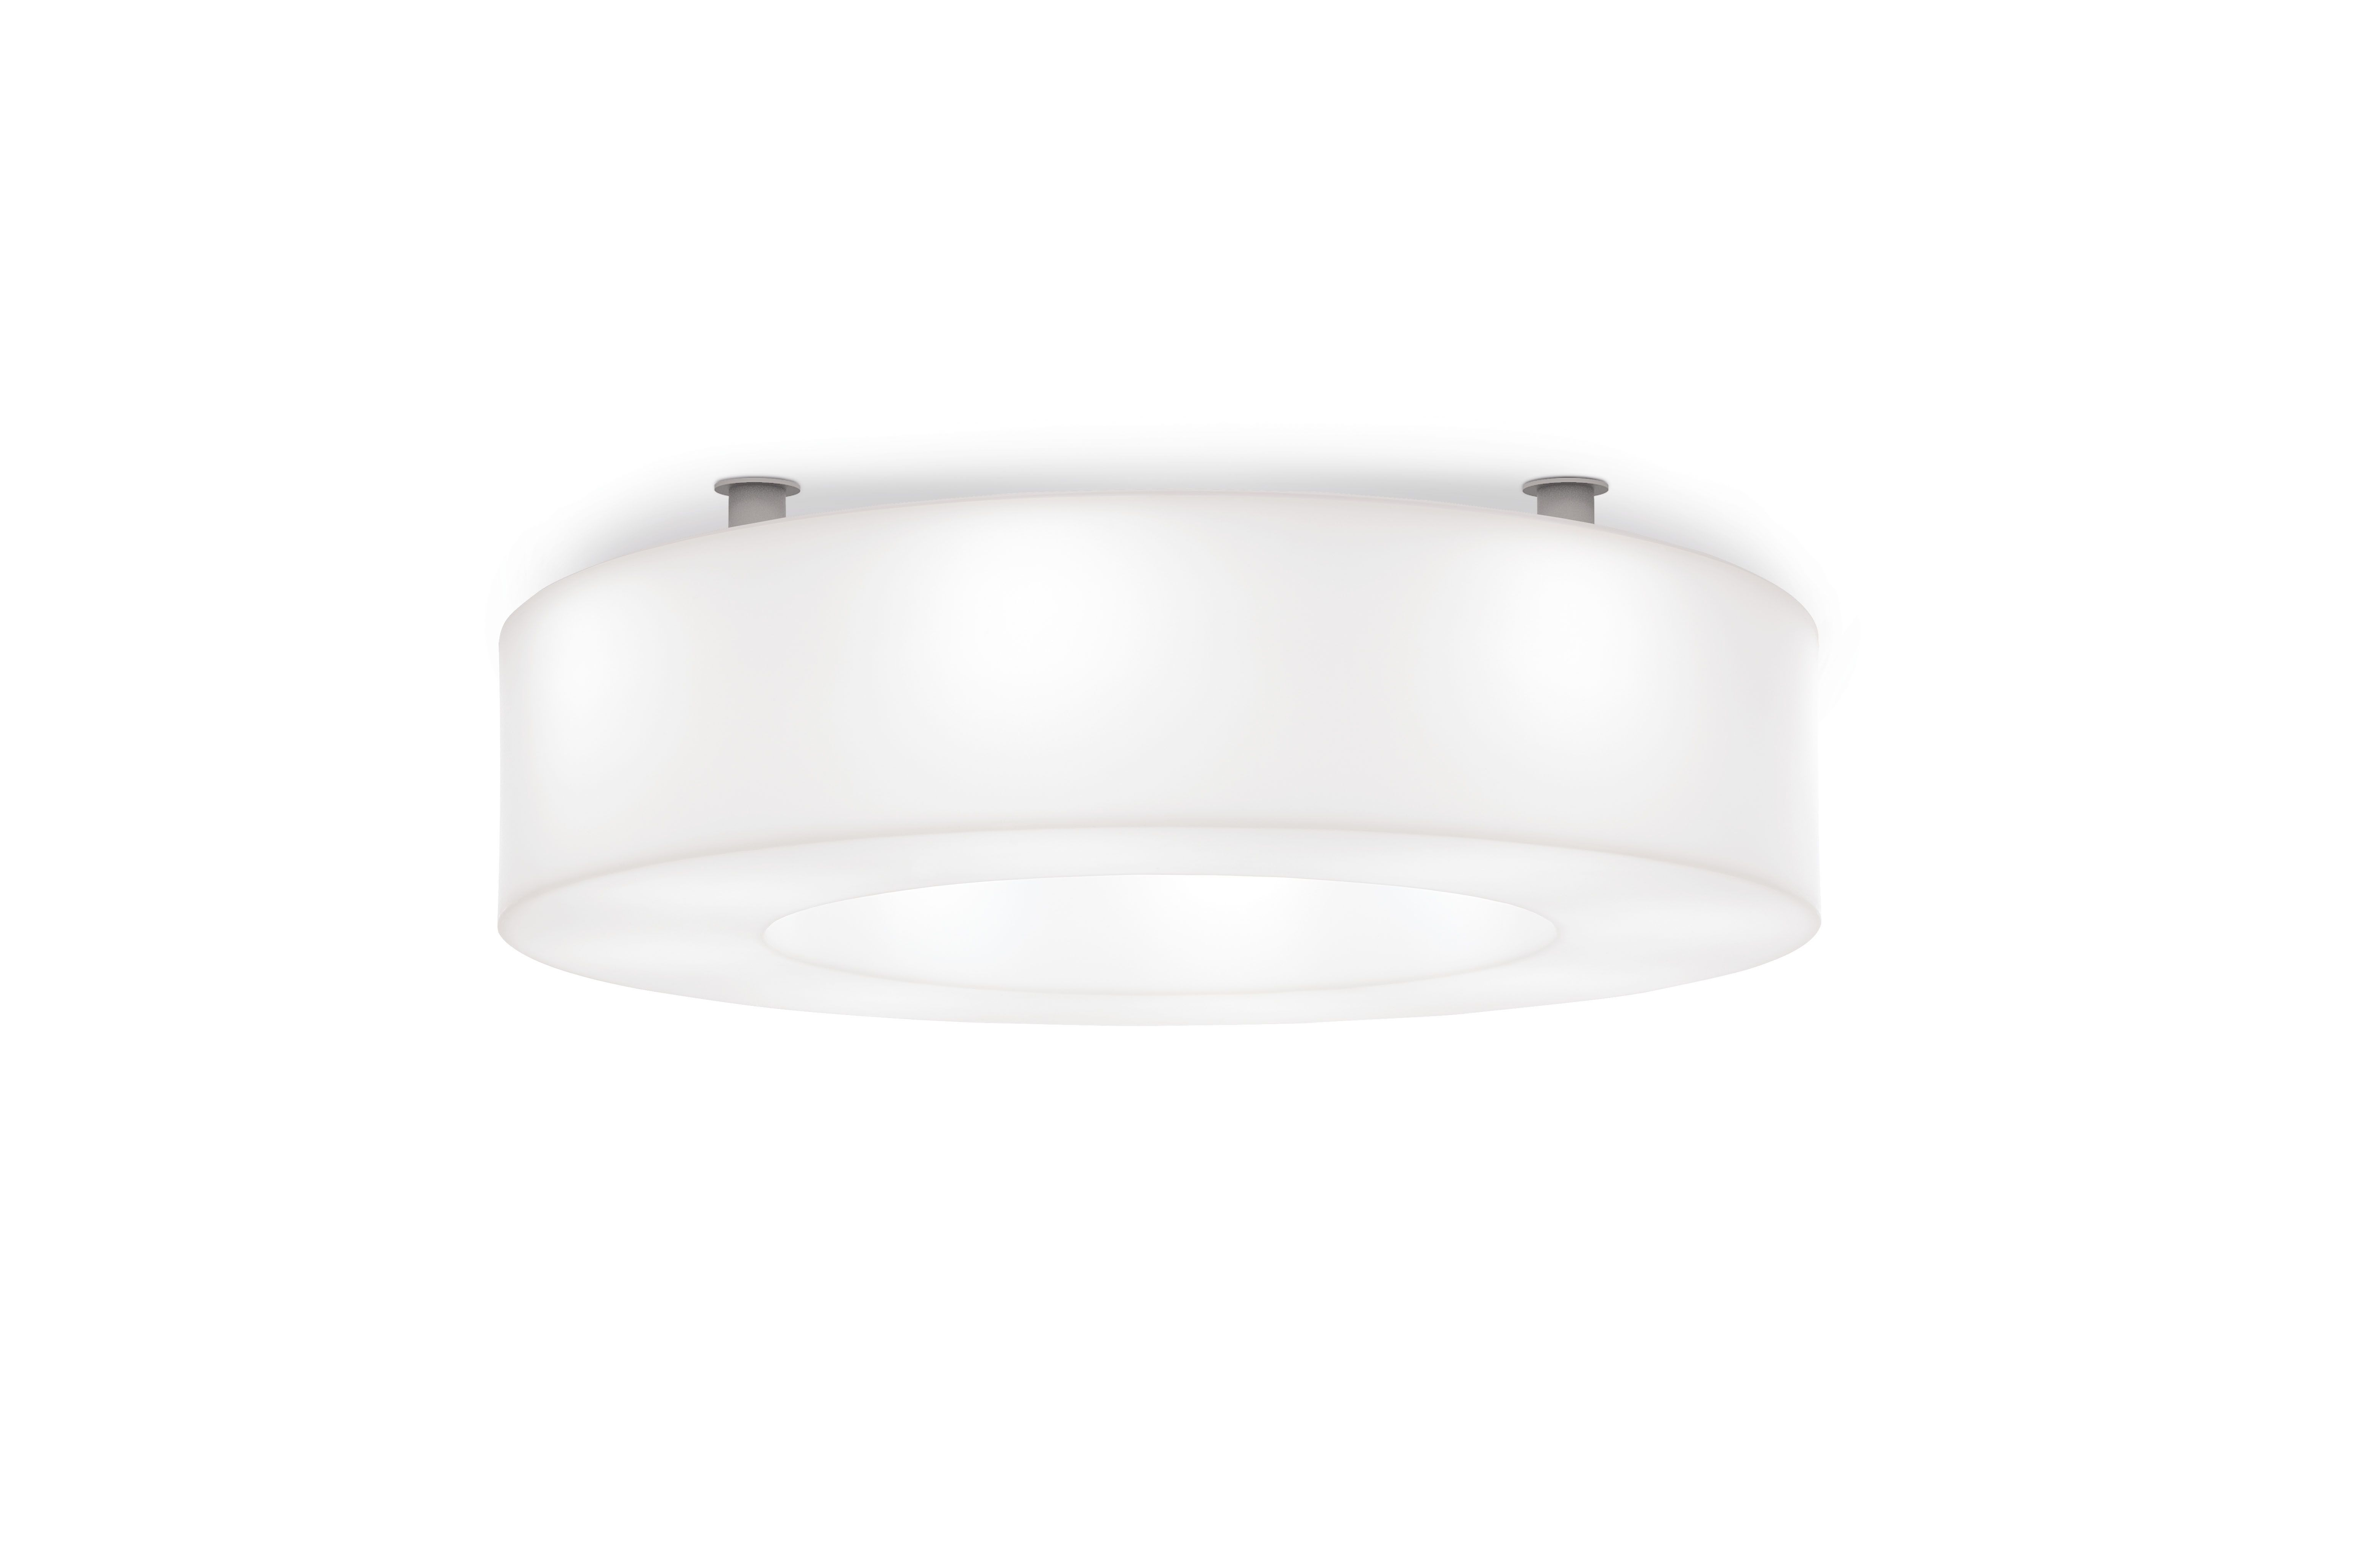 Atollo applique ceiling lighting ceiling lights